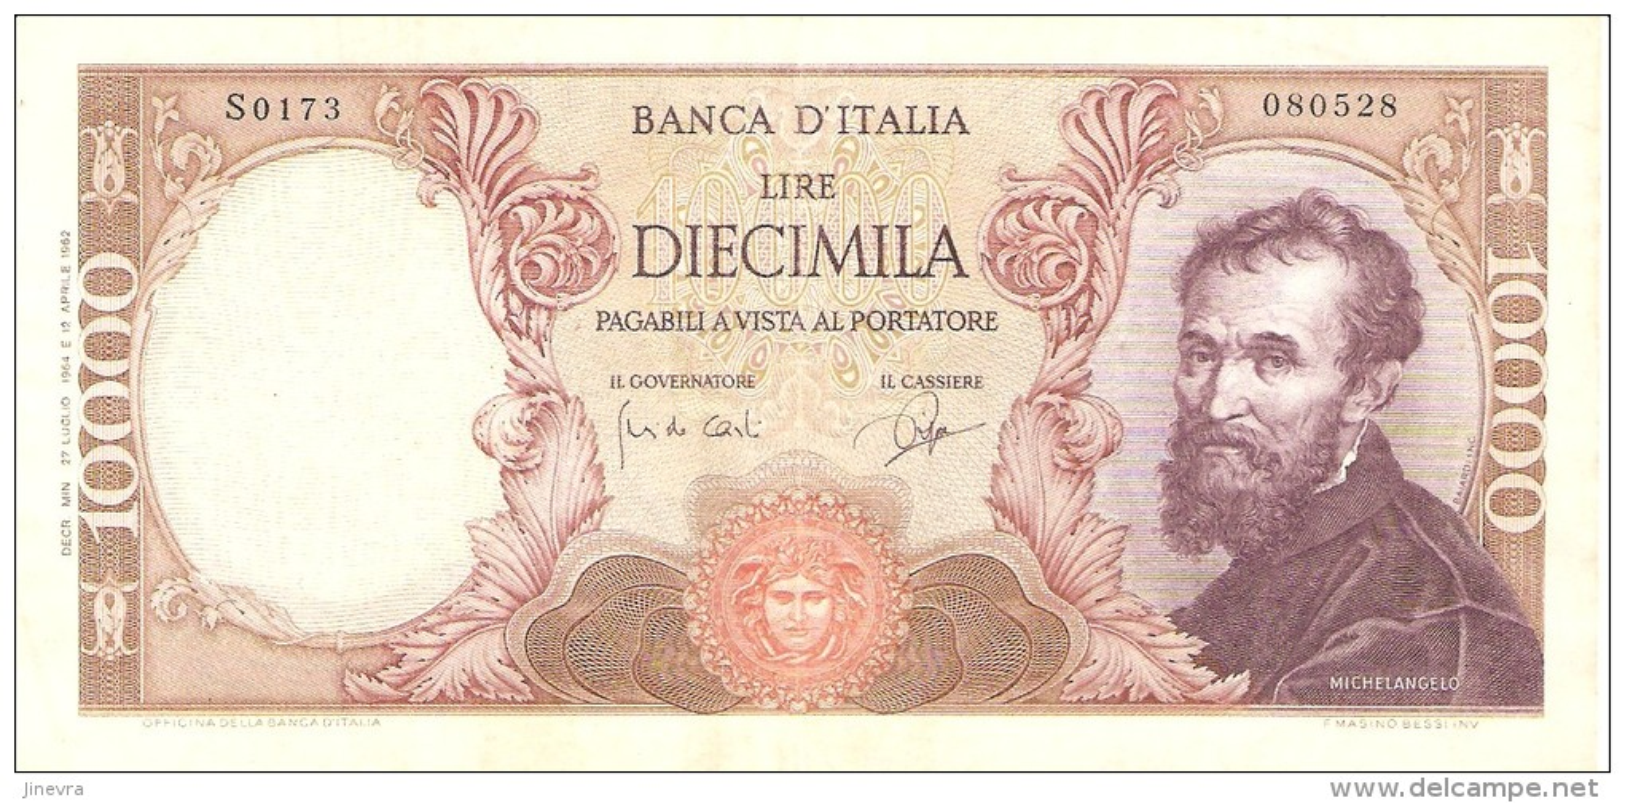 ITALY 10000 LIRE 1964 PICK 97b XF RARE - [ 2] 1946-… : Républic